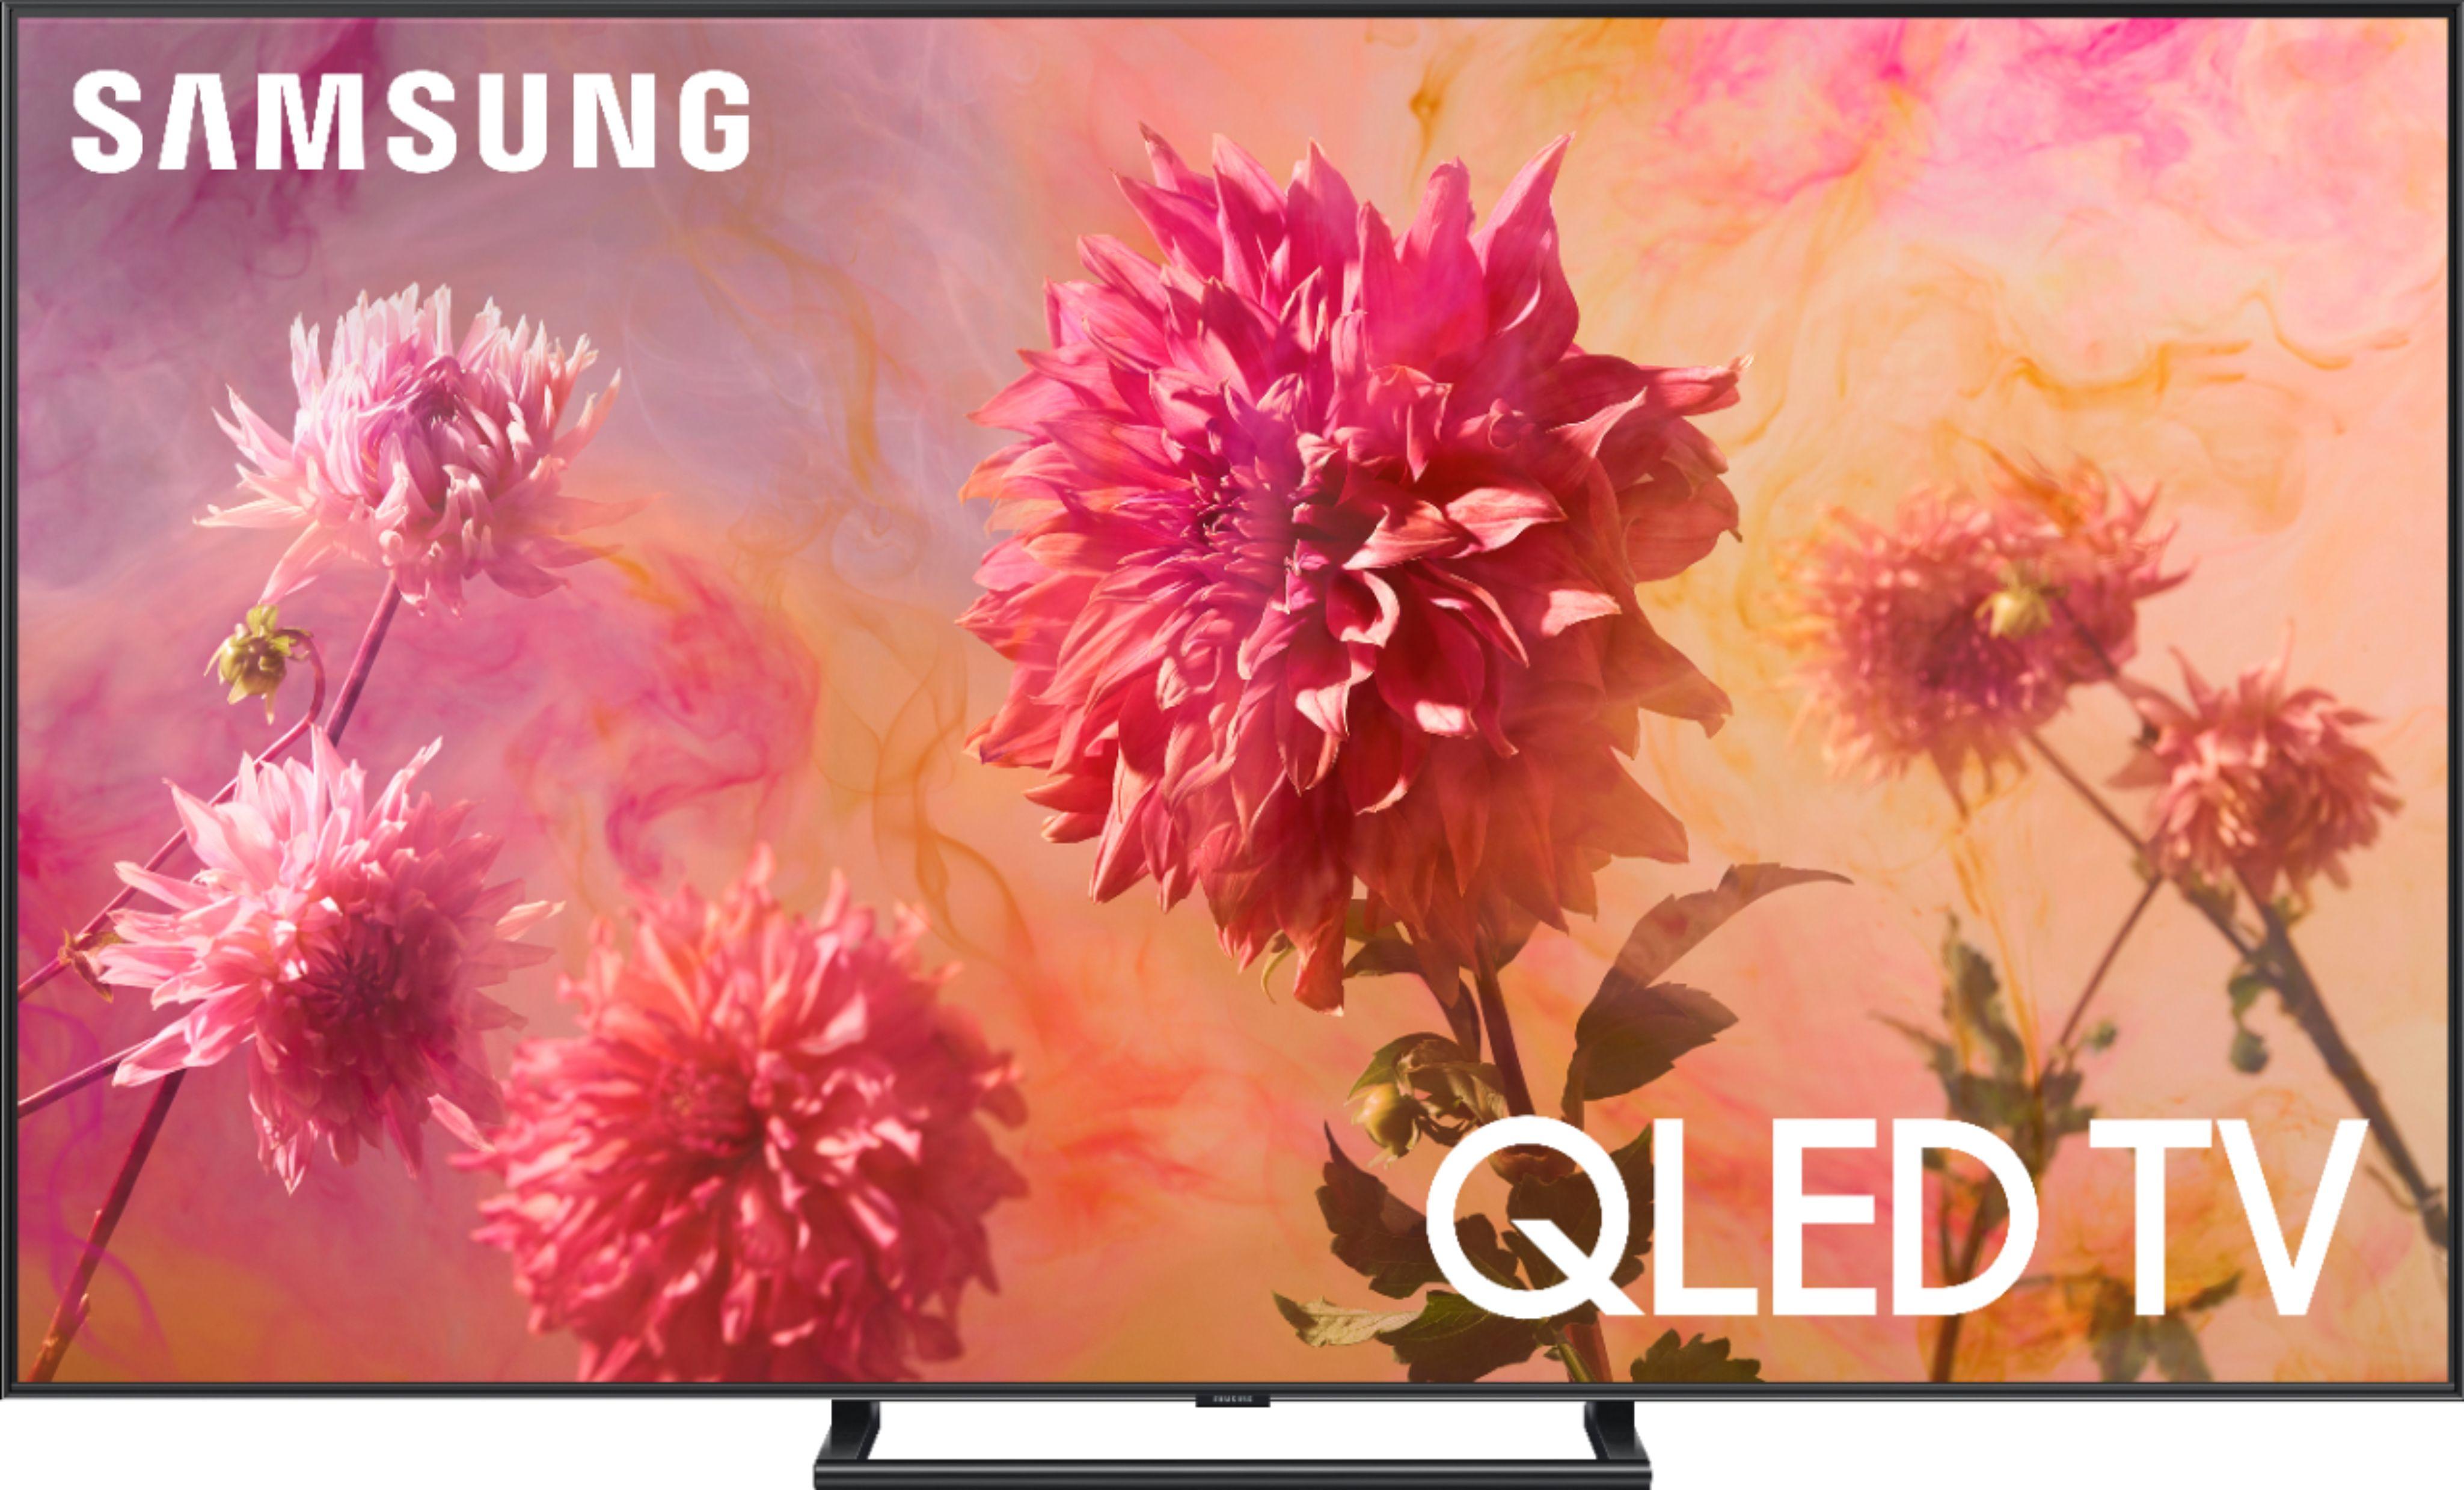 Image 16 for Samsung QN75Q9FNAFXZA